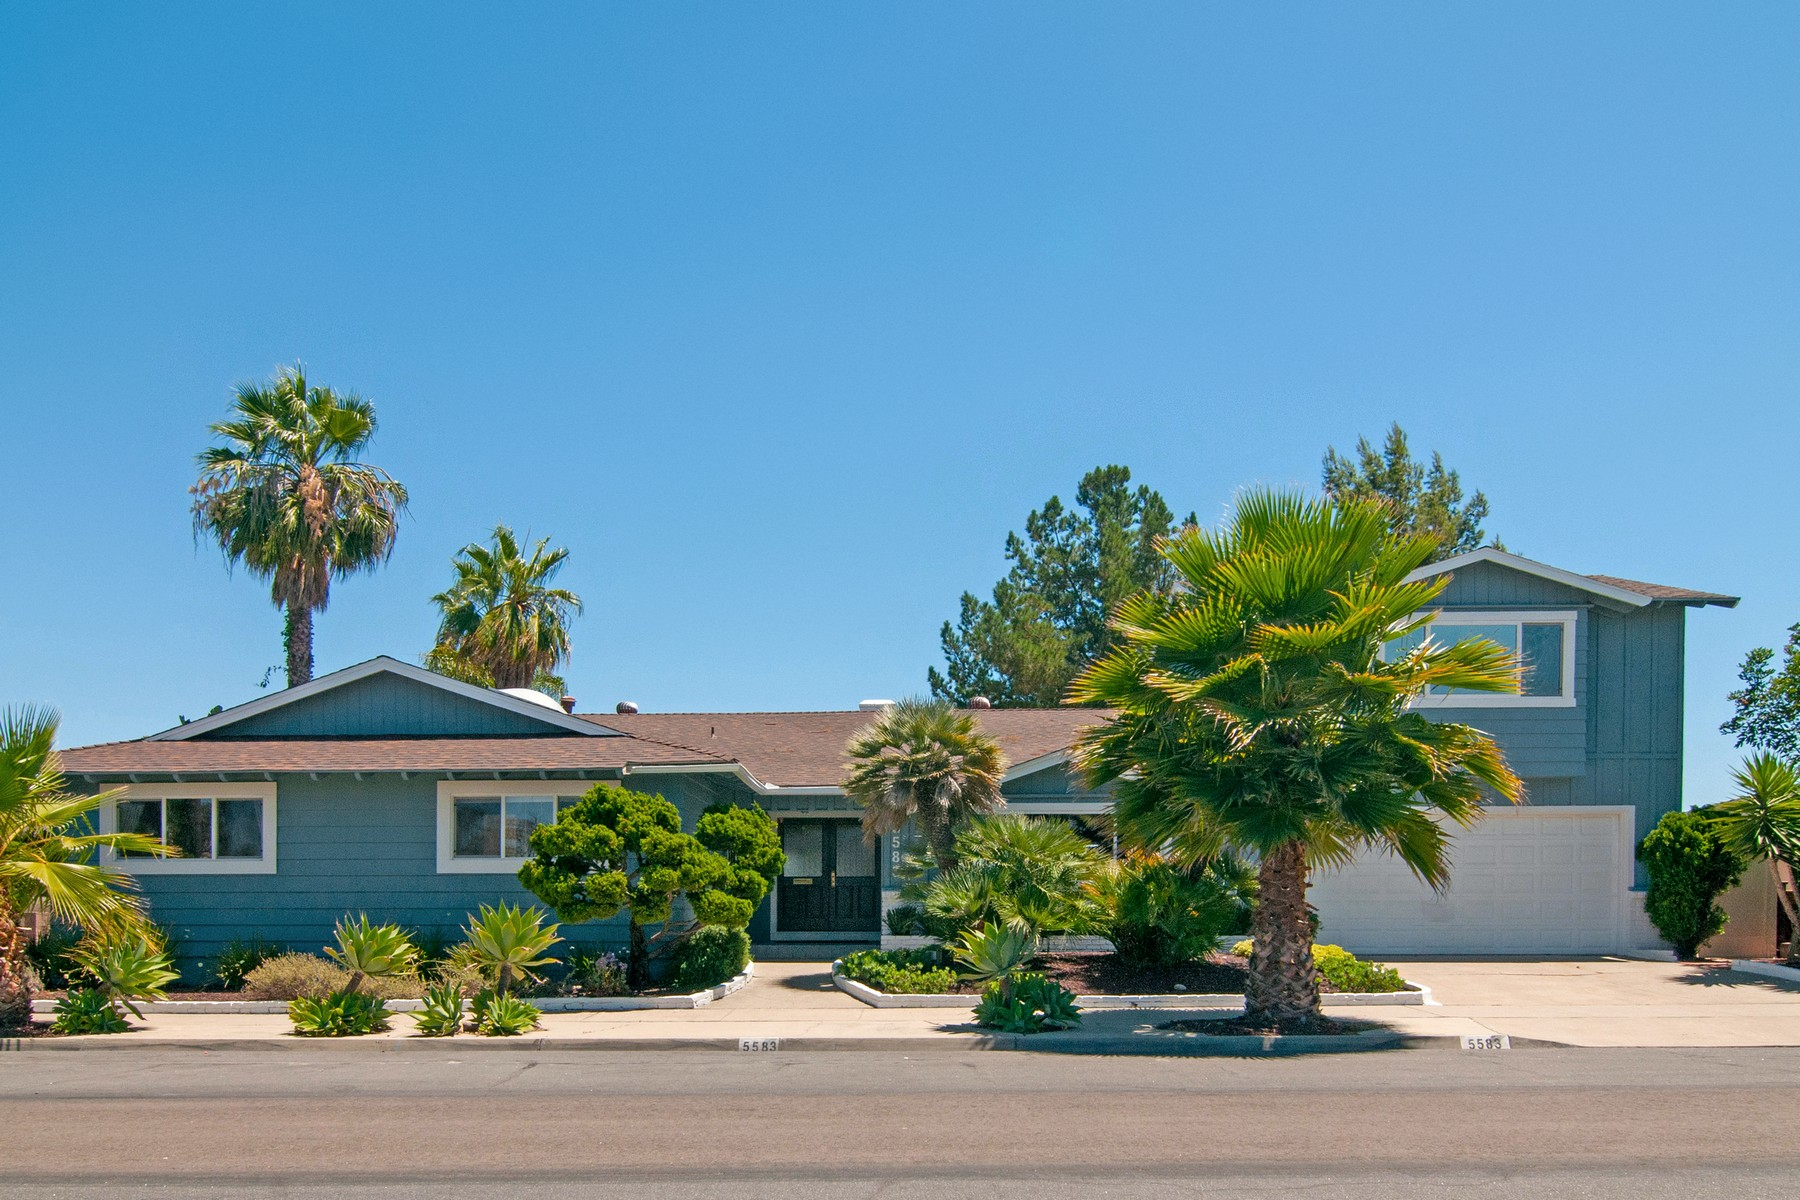 独户住宅 为 销售 在 5583 Del Cerro 5583 Del Cerro Blvd. Del Cerro, 圣地亚哥, 加利福尼亚州, 92120 美国